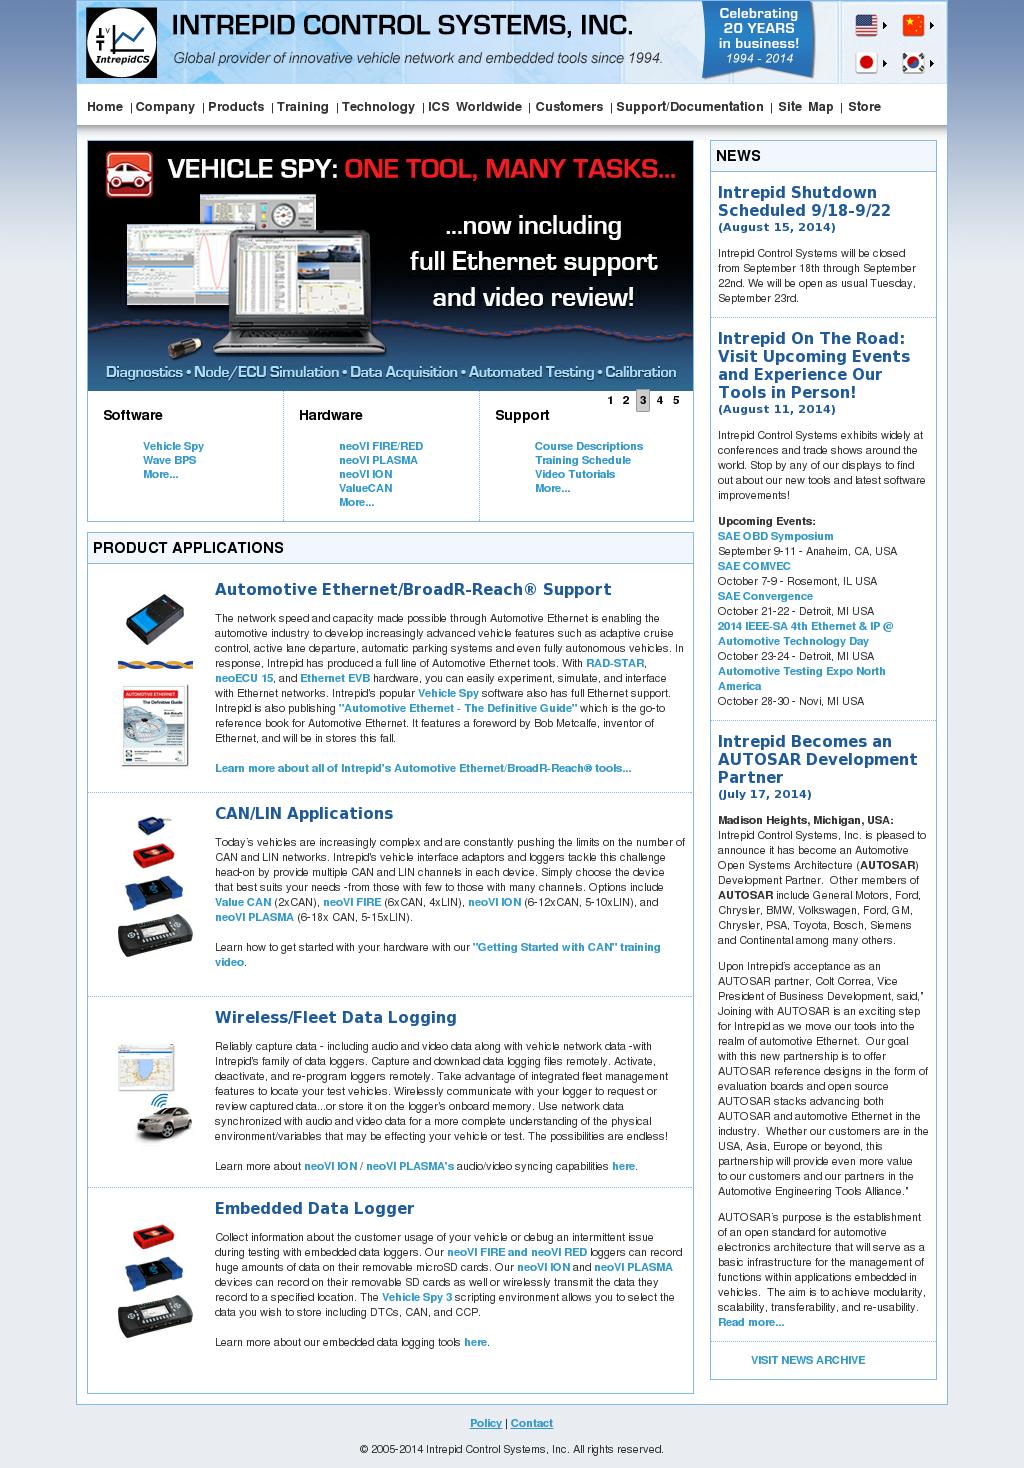 IntrepidCS Competitors, Revenue and Employees - Owler